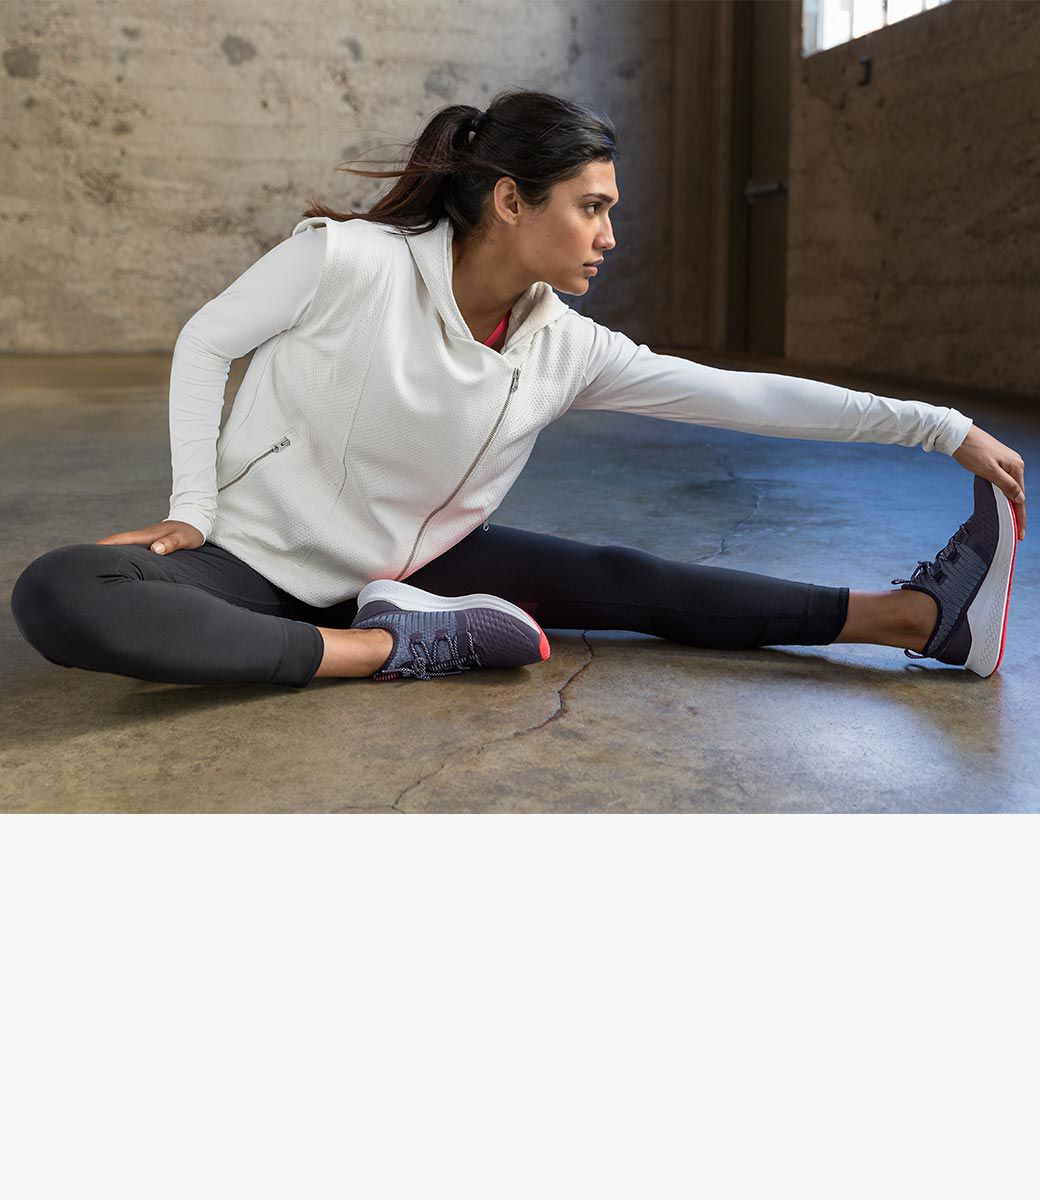 New Balance Women's Lazr Hyposkin Look Q118,